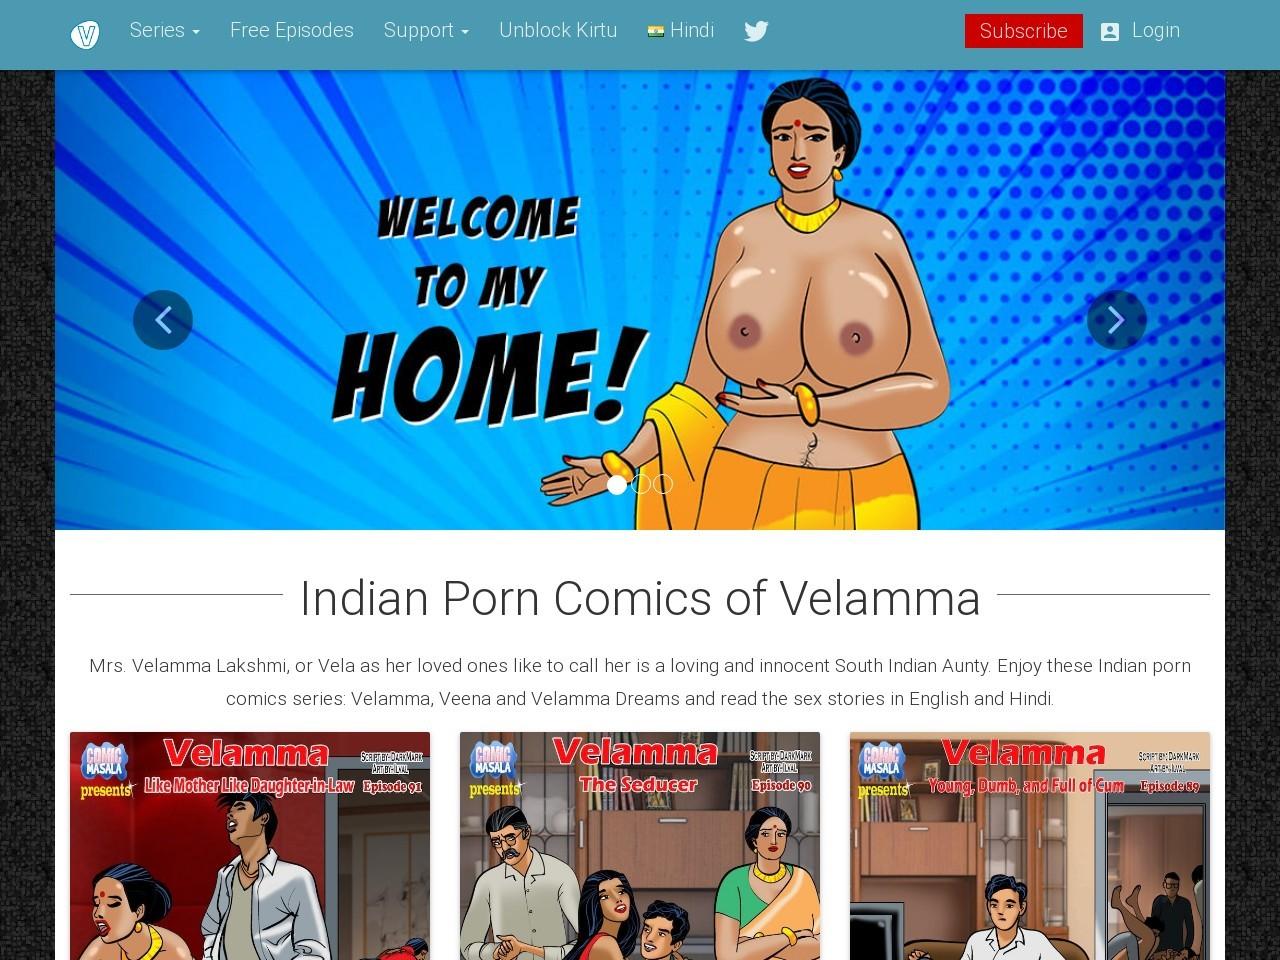 Hindi font stories of sex